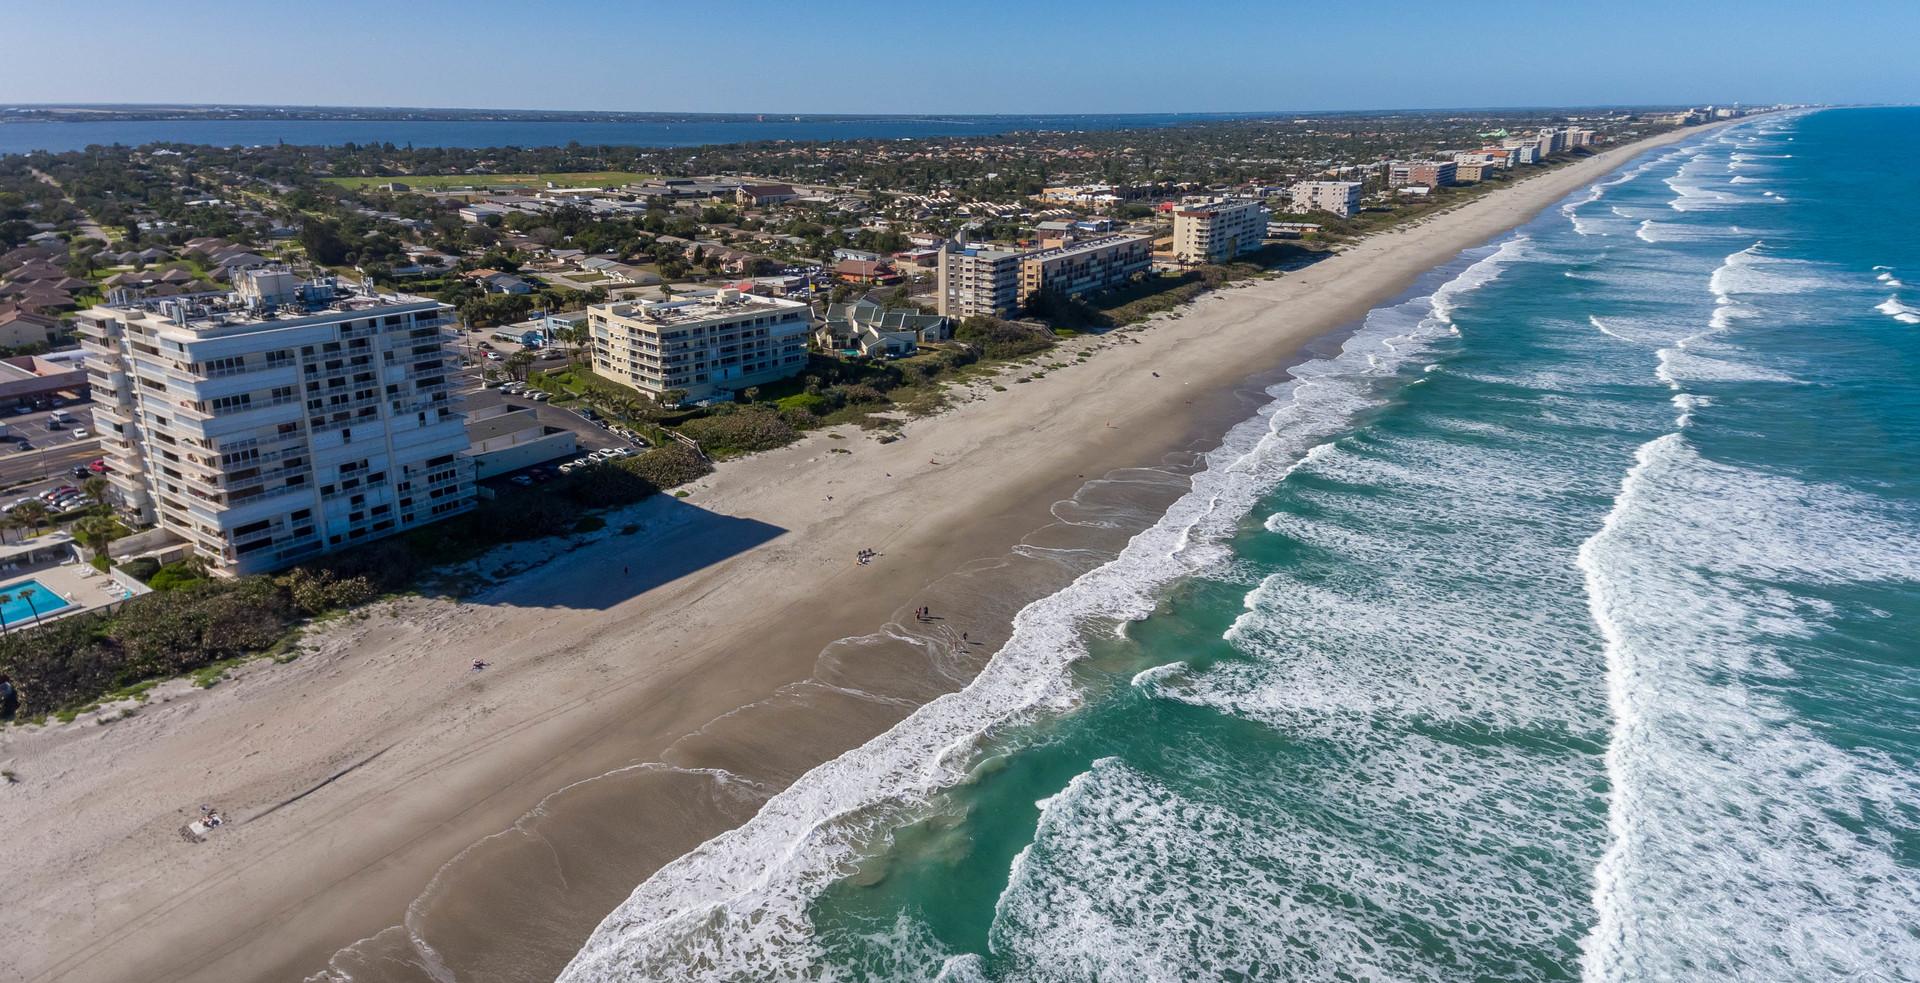 Aerial View Melbourne Florida